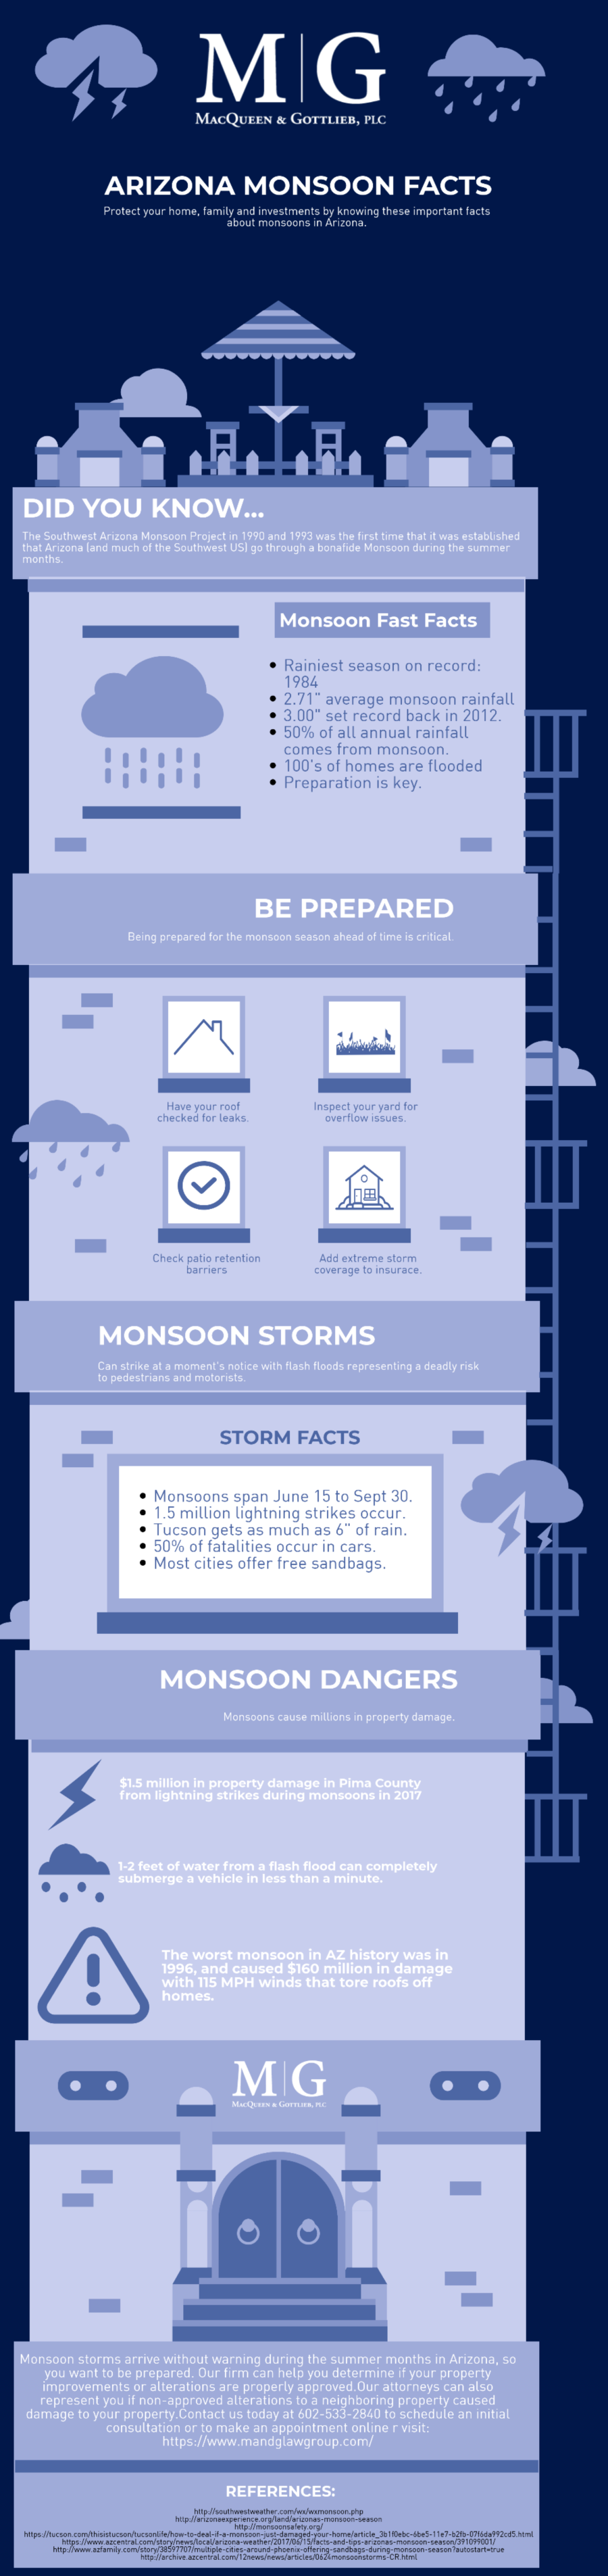 arizona monsoon facts